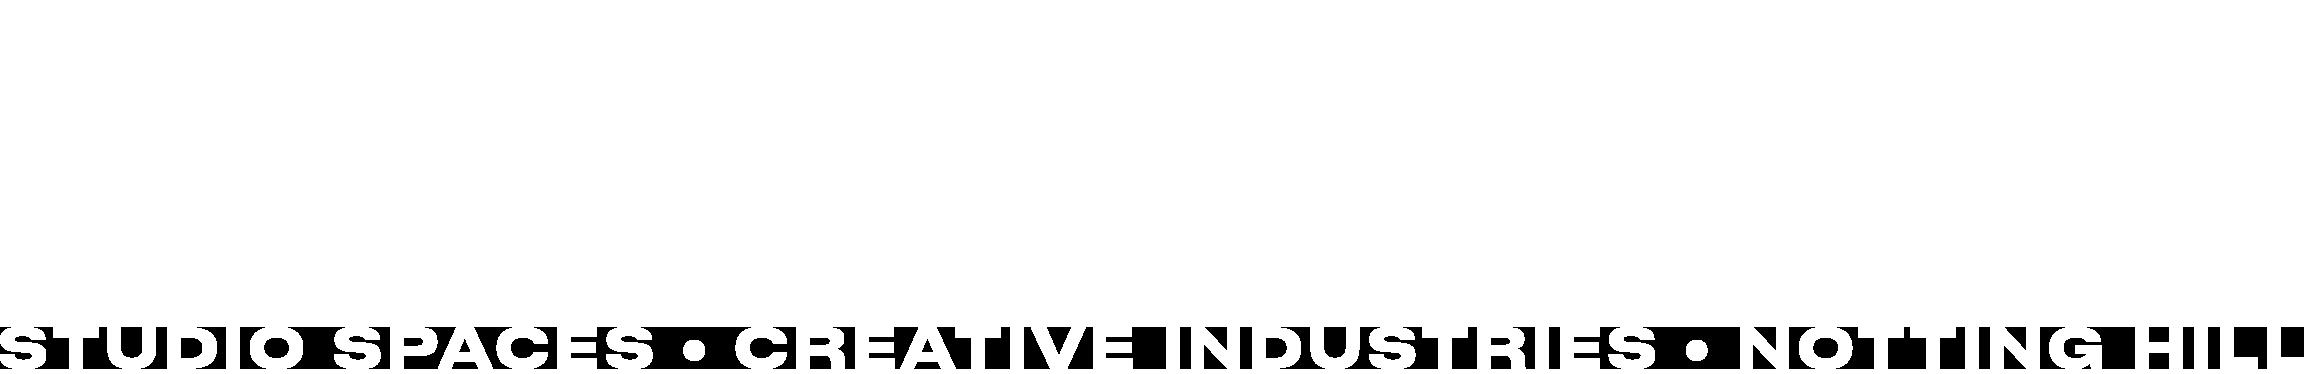 Great Western Studios